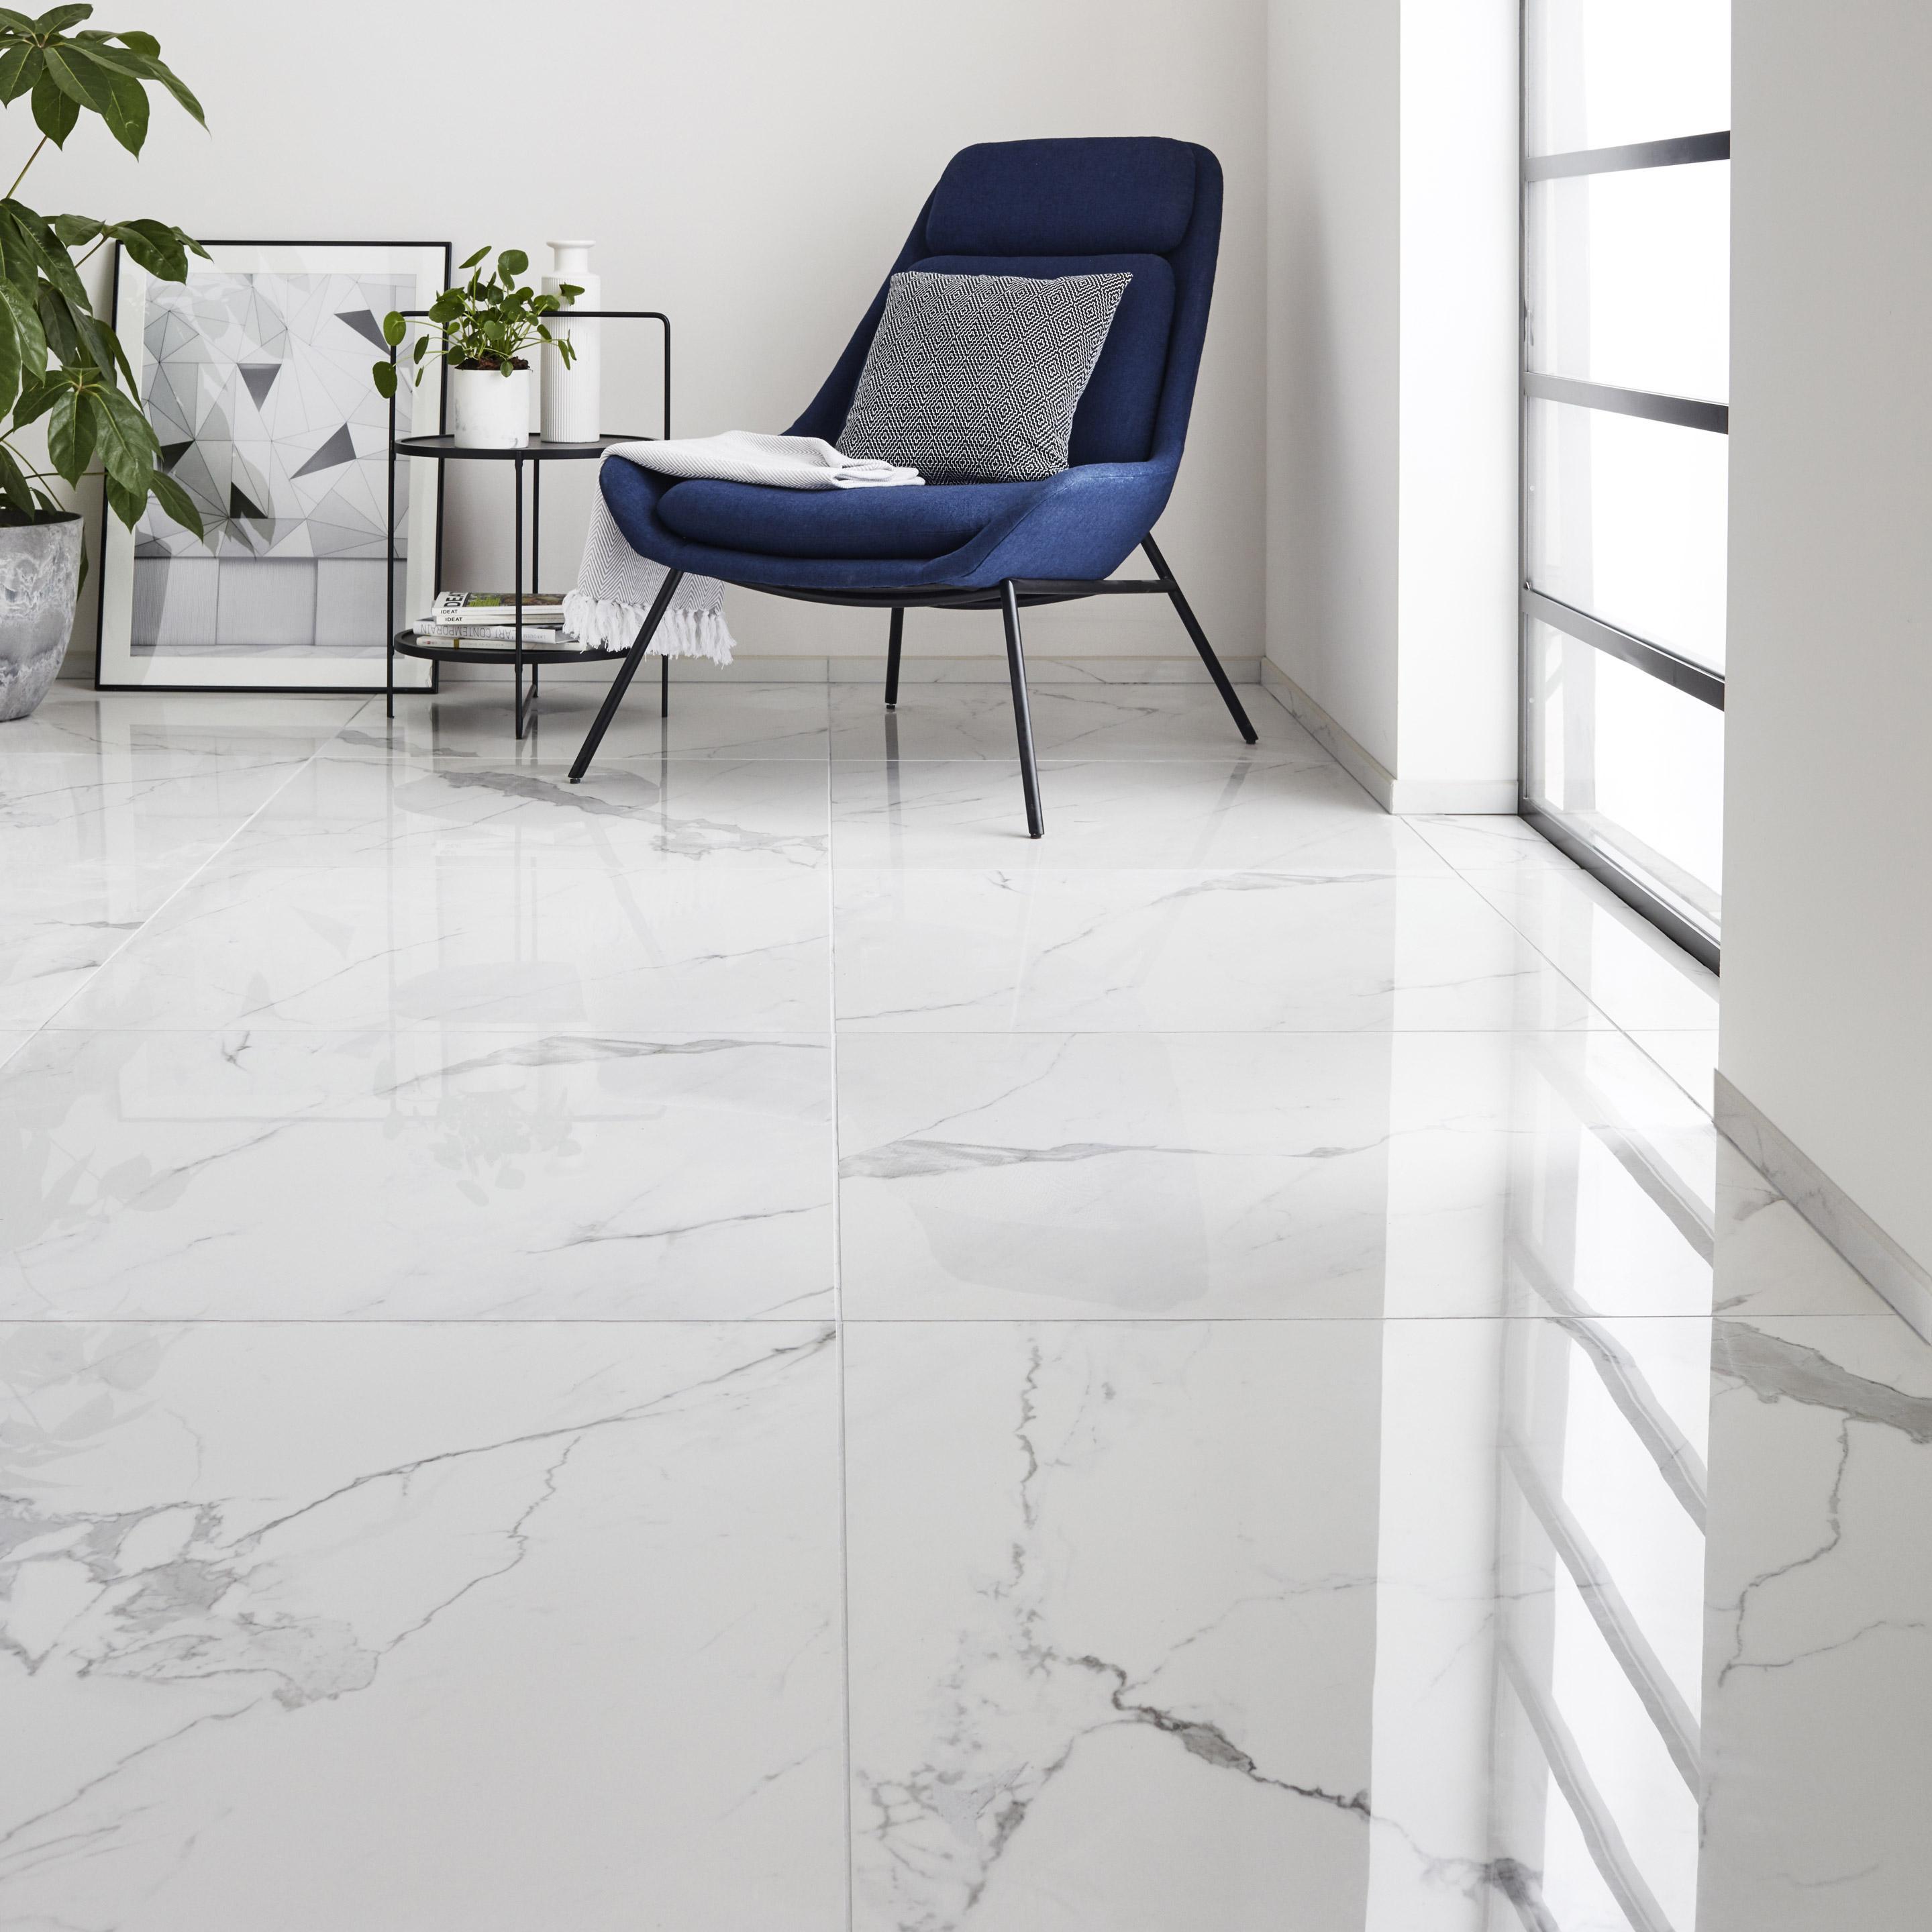 Carrelage sol et mur intenso effet marbre blanc Rimini l.80 x L.80 cm CERIM INSP